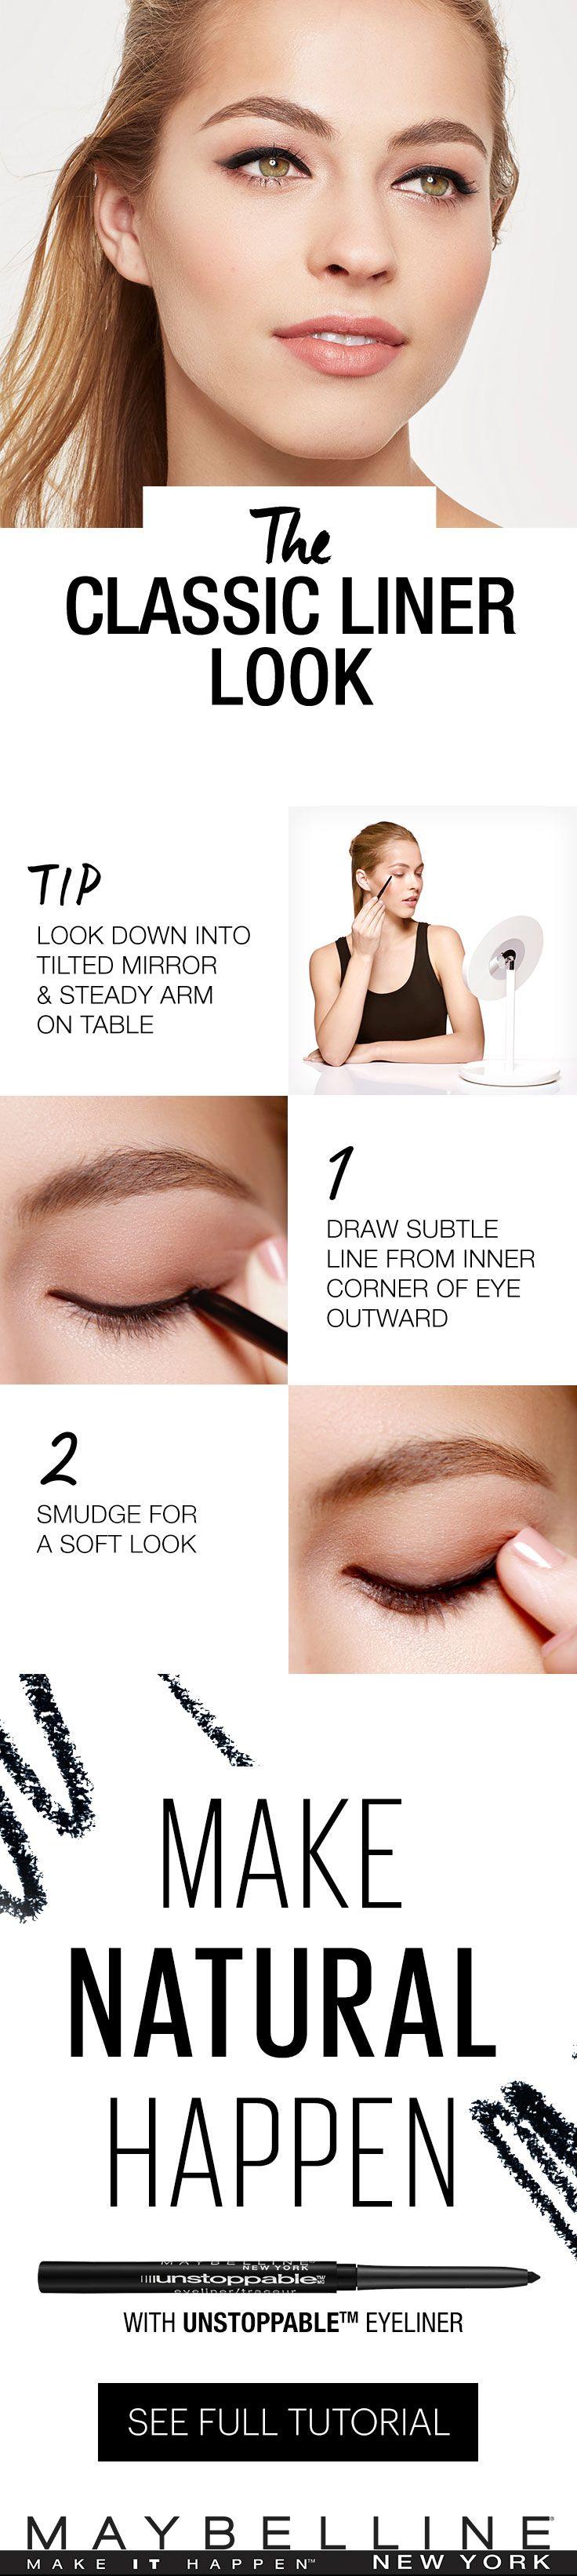 #eyeliner @stylexpert